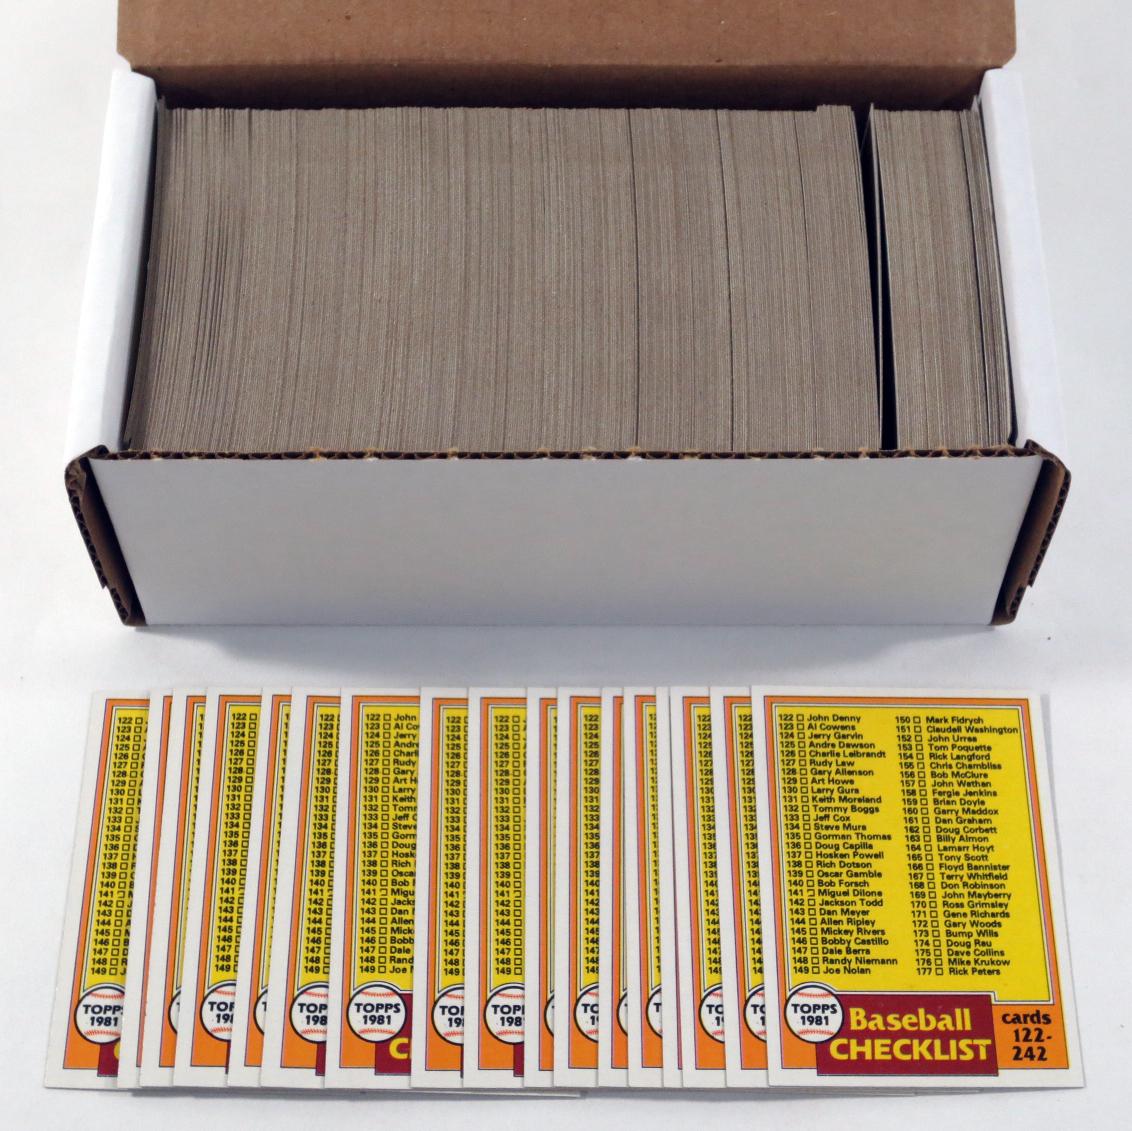 400 1981 Topps Checklist #241 ^ Nm//Mt to Mint ^ Vending Quality ^ BV $100